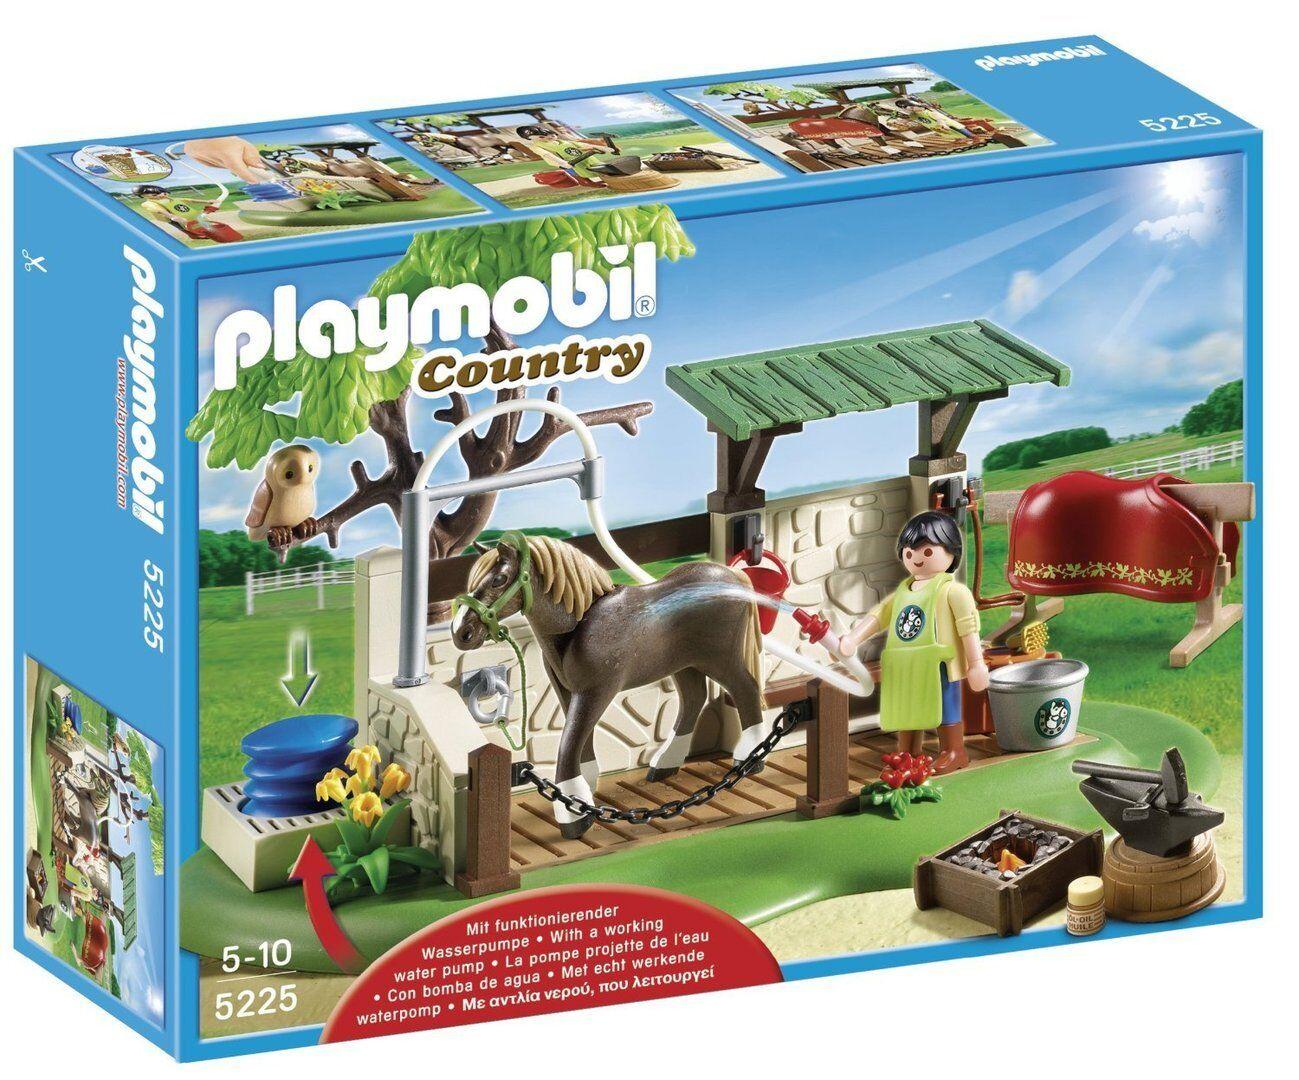 Playmobil 5225 - Ducha para Caballos - NUEVO